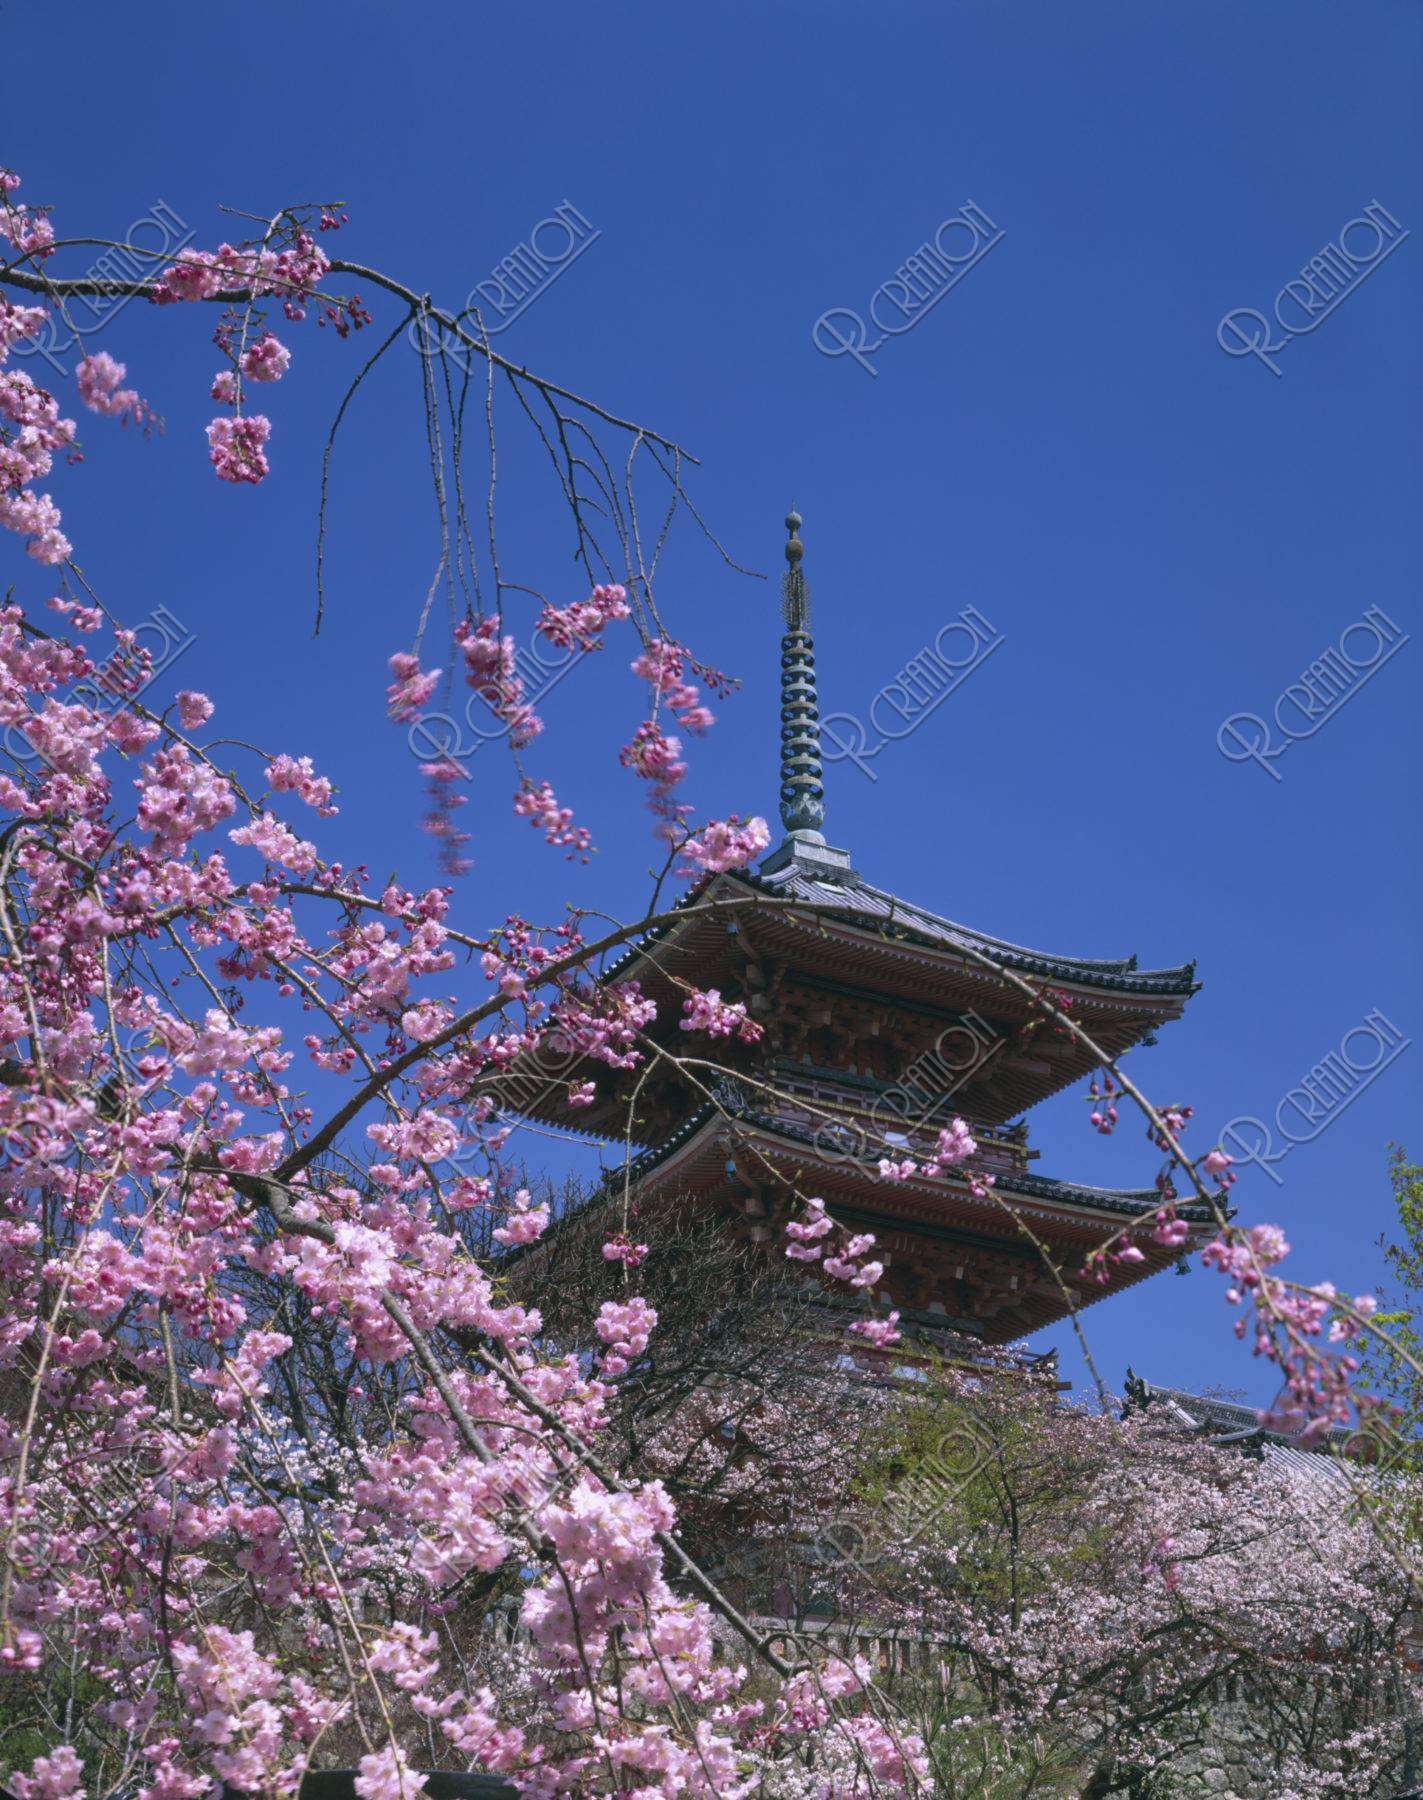 清水寺 三重塔と桜 世界遺産